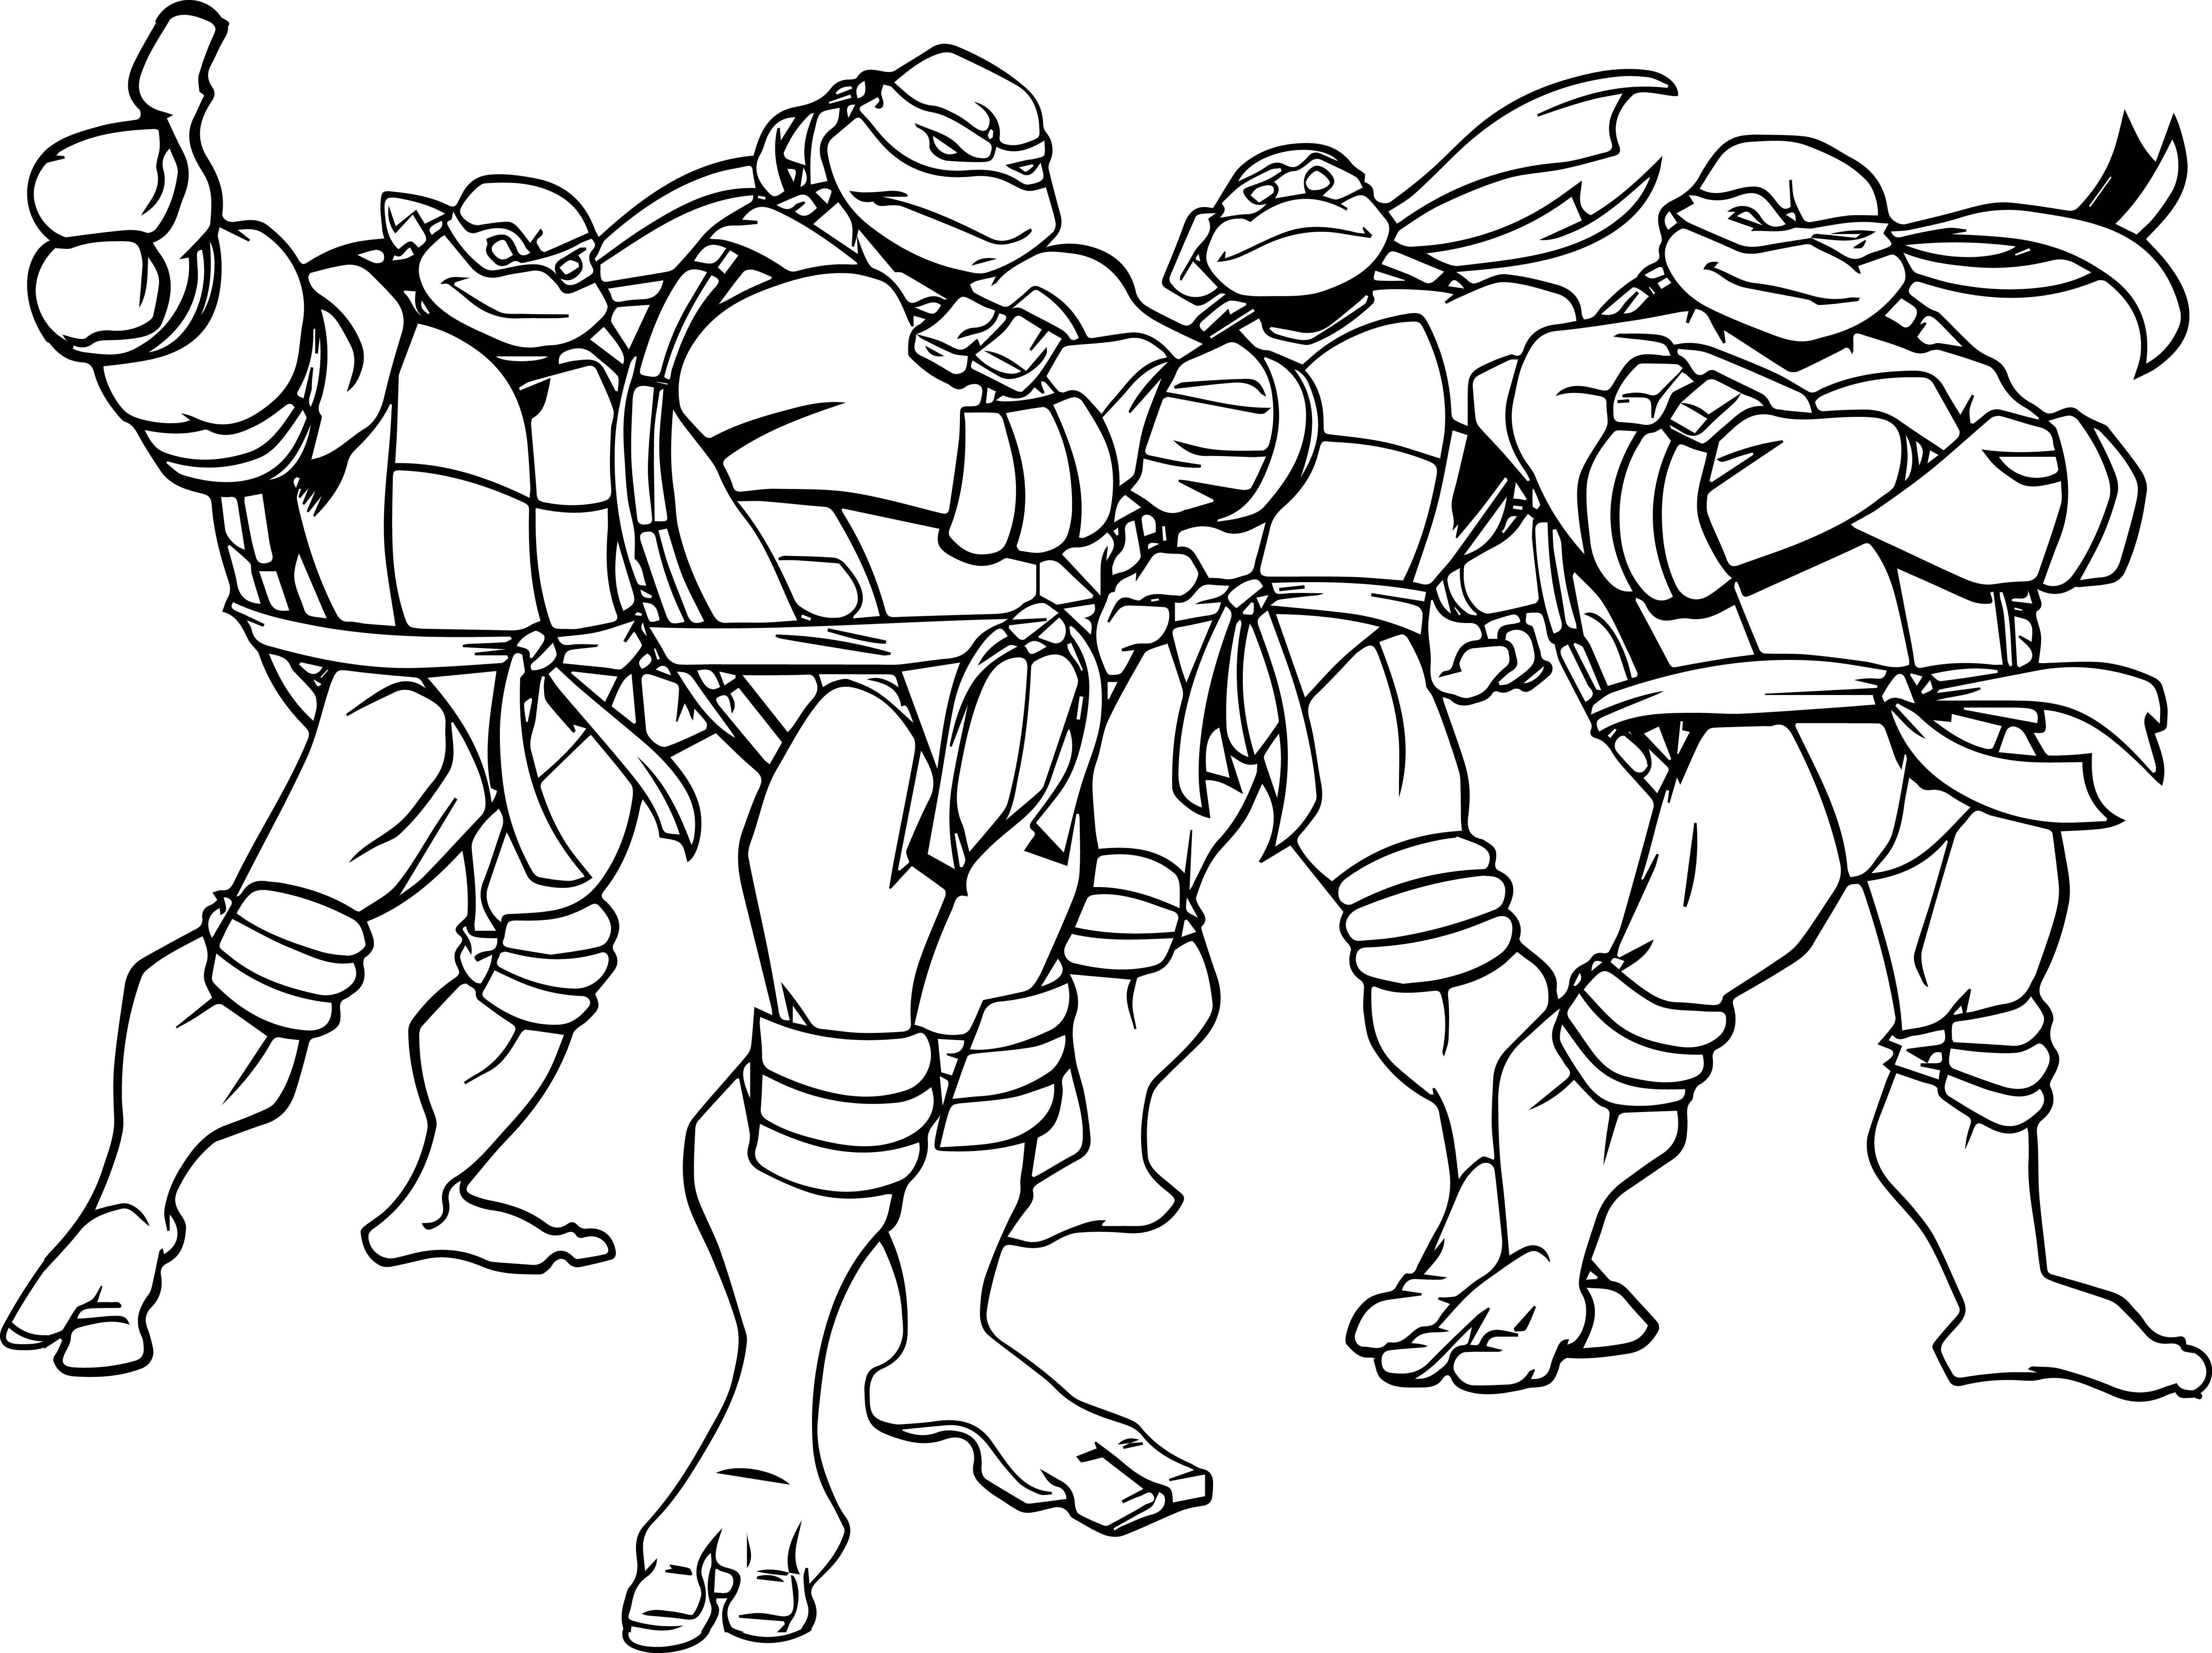 6176x4614 Teenage Mutant Ninja Turtles Coloring Page Paginone.biz